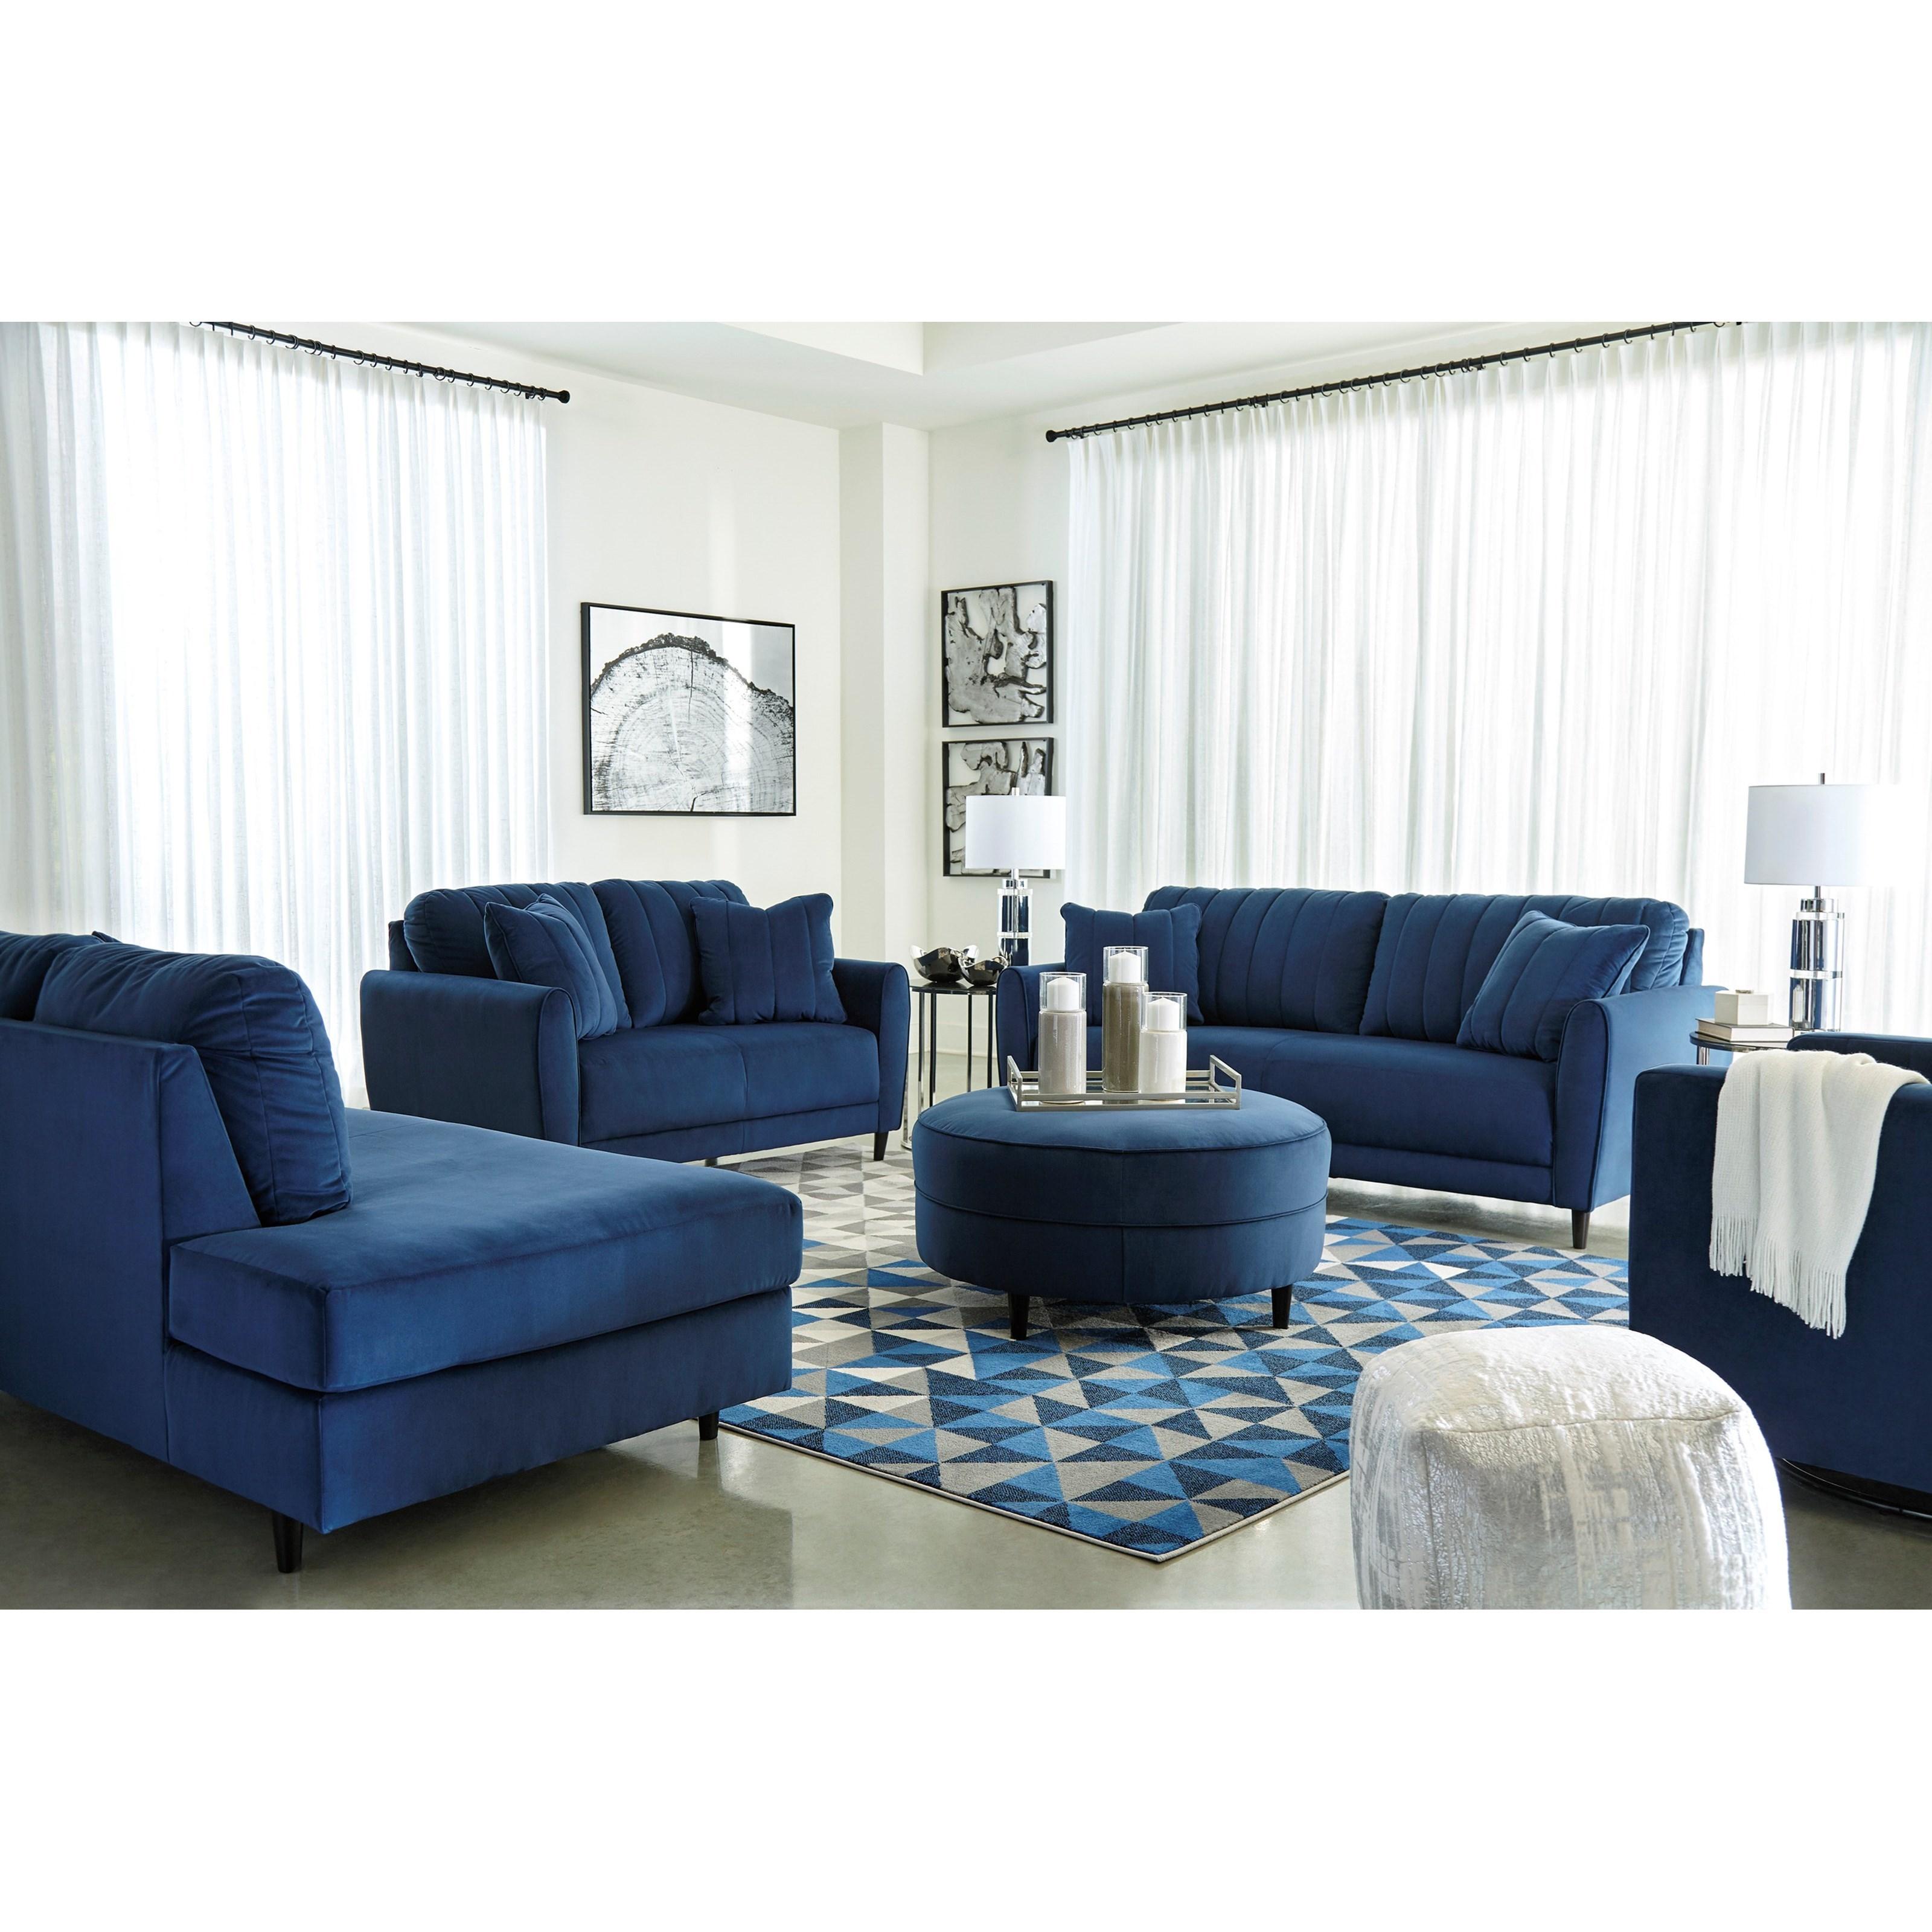 Enderlin Living Room Group by Ashley (Signature Design) at Johnny Janosik